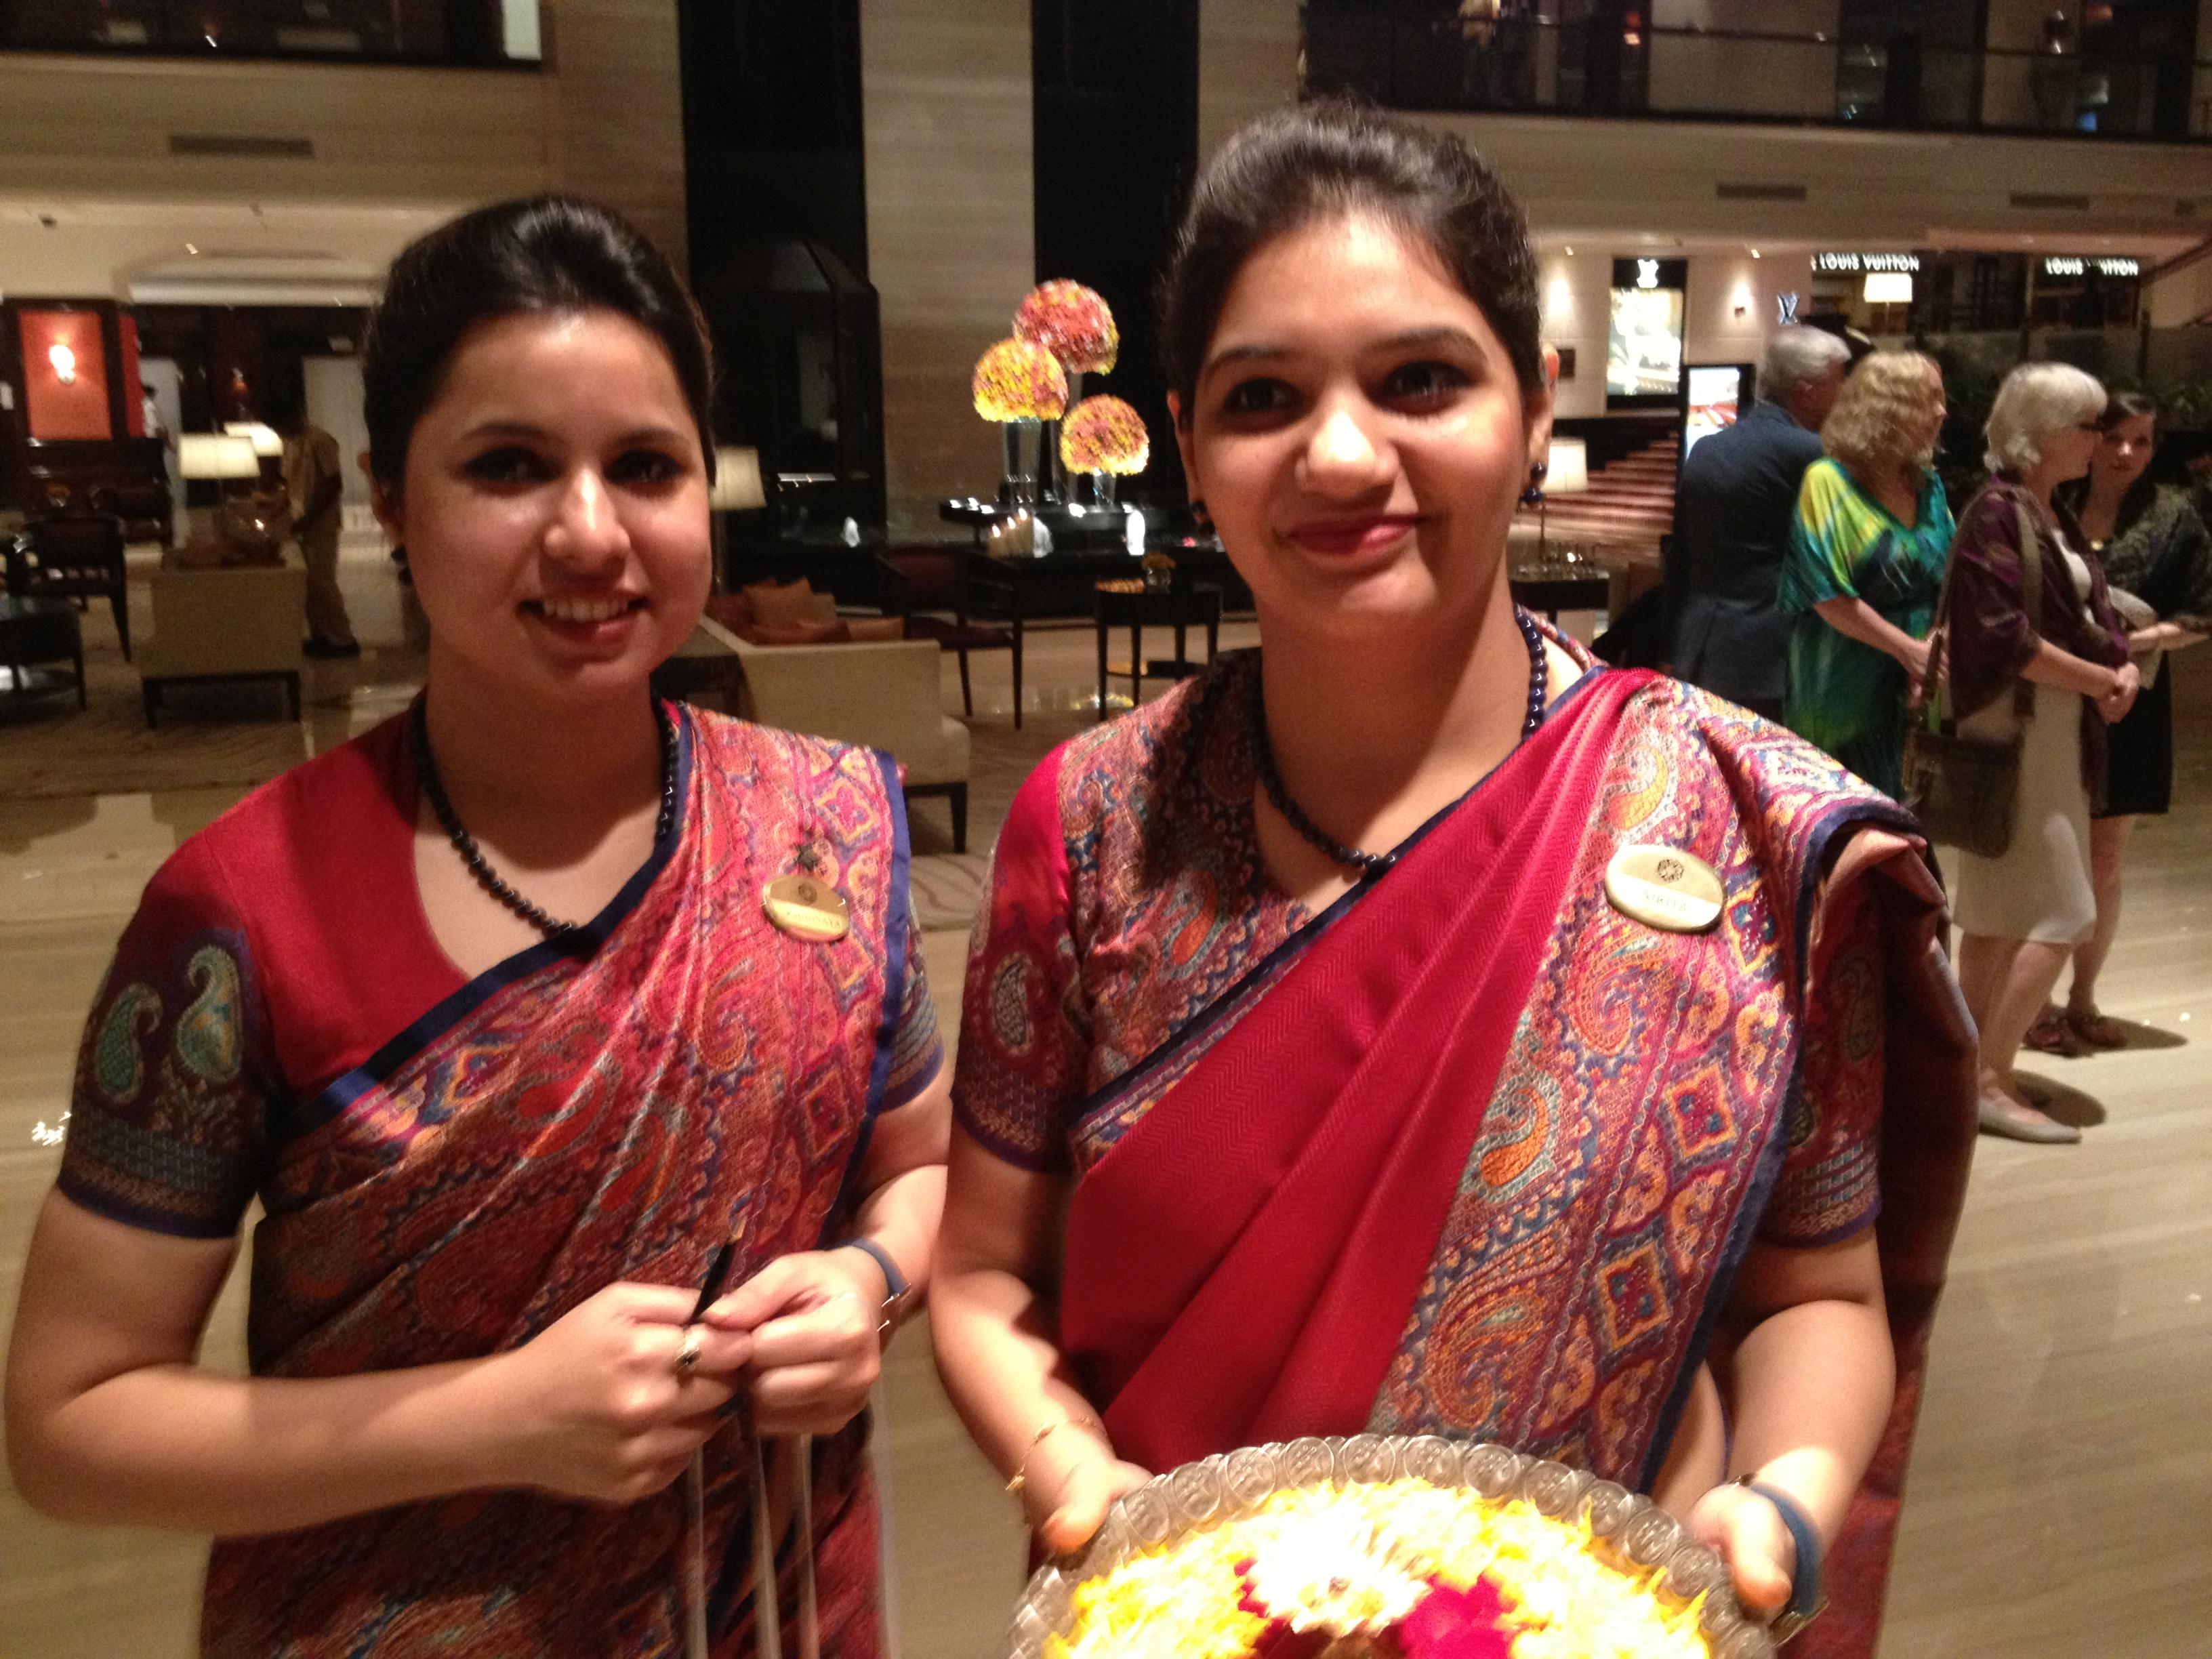 India A Cultural Kaleidoscope